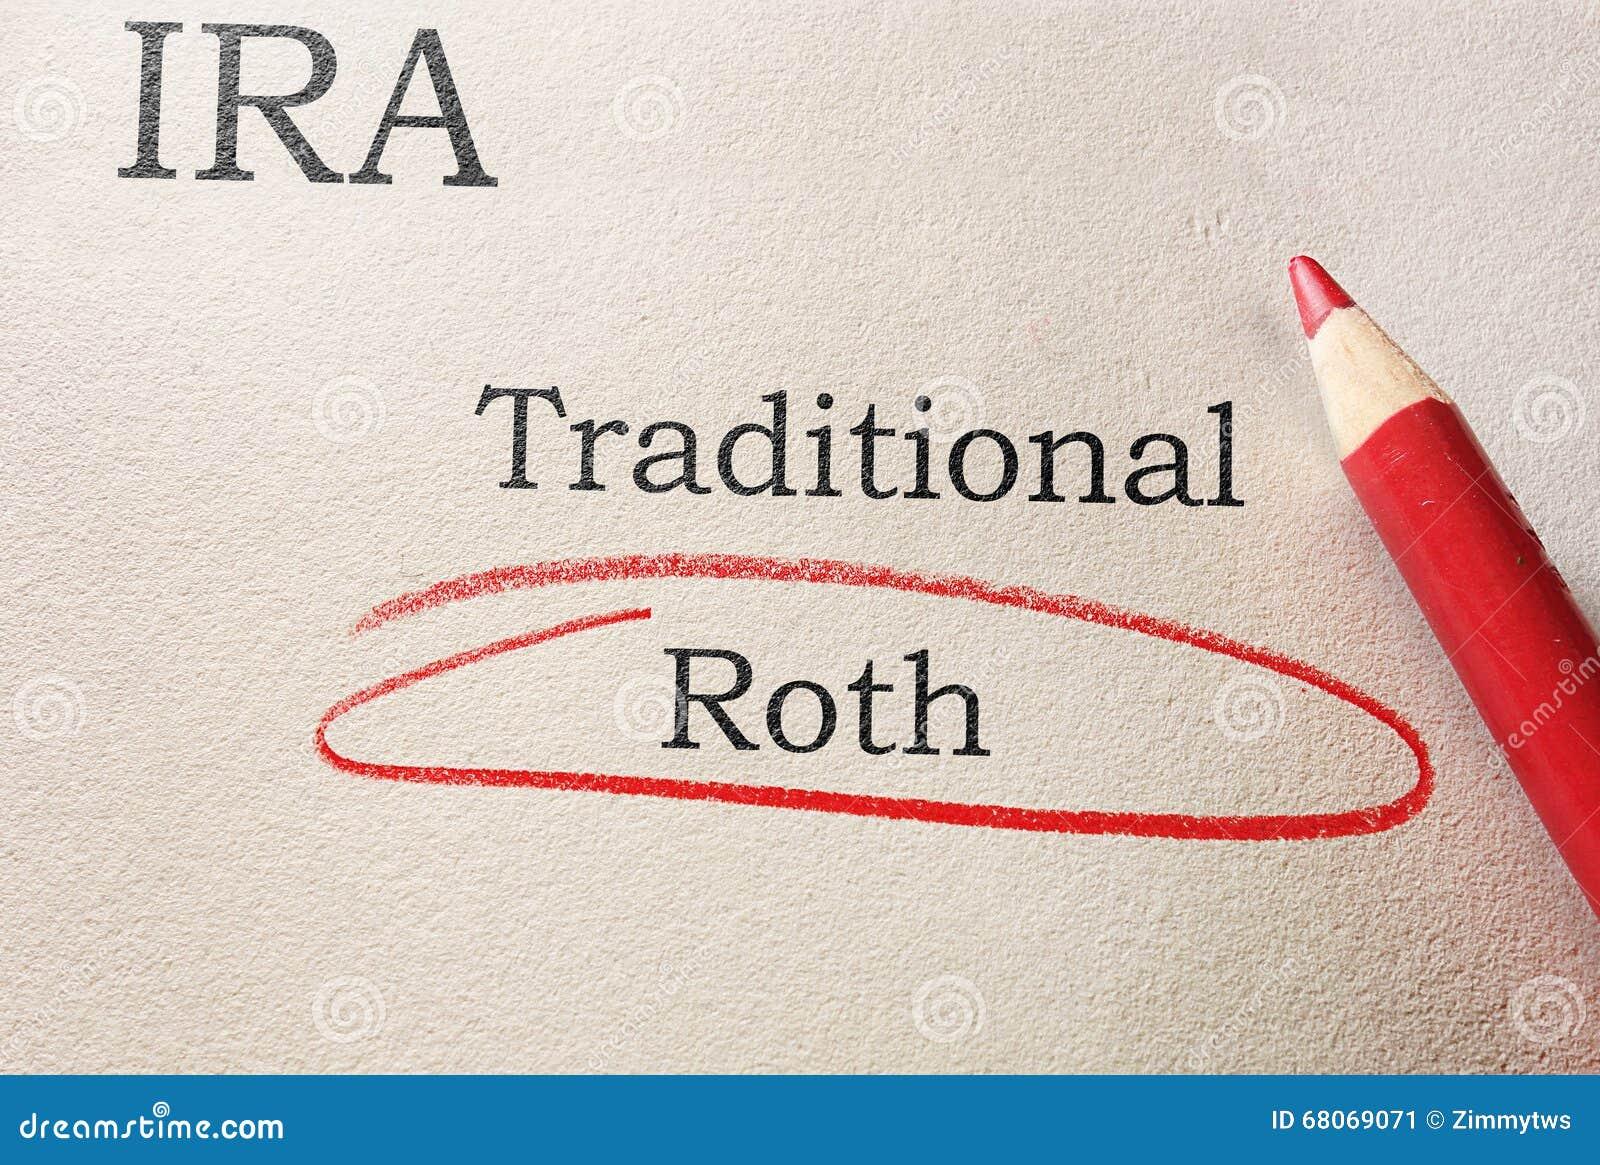 Roth IRA ha circondato